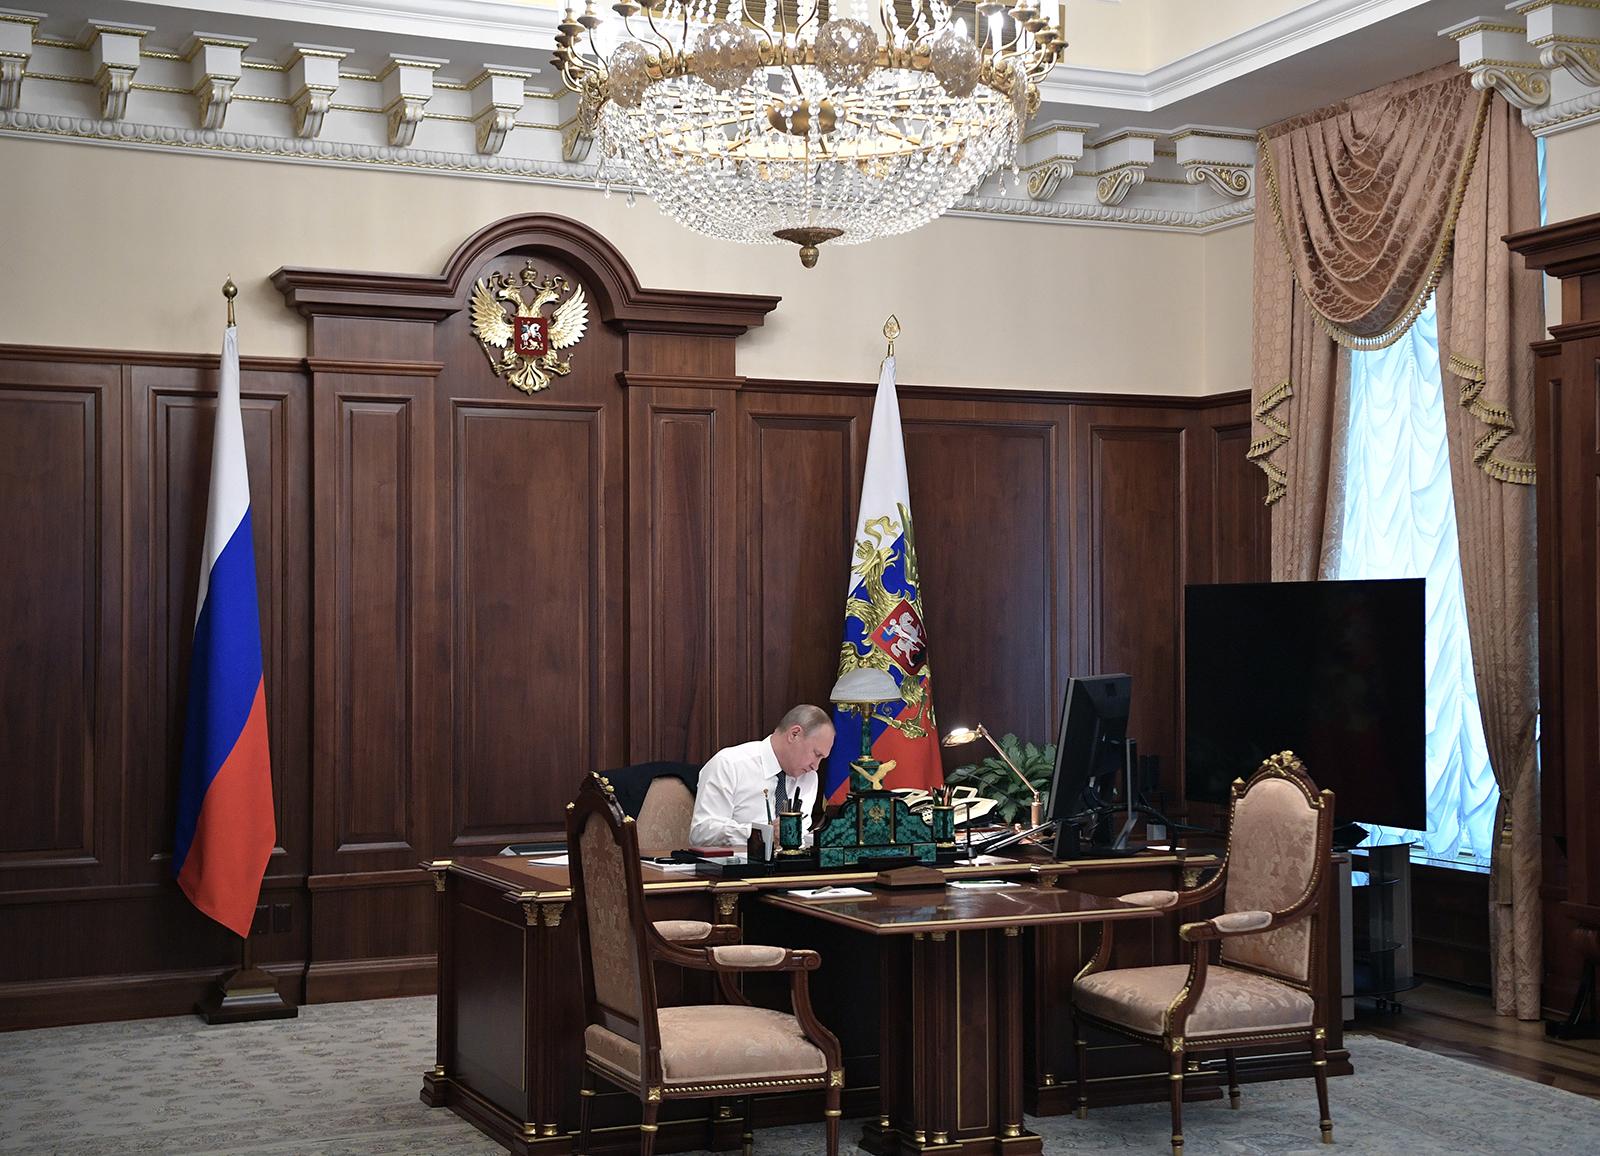 Photos Of Vladimir Putin S Inauguration Ceremony And Cortege Limo